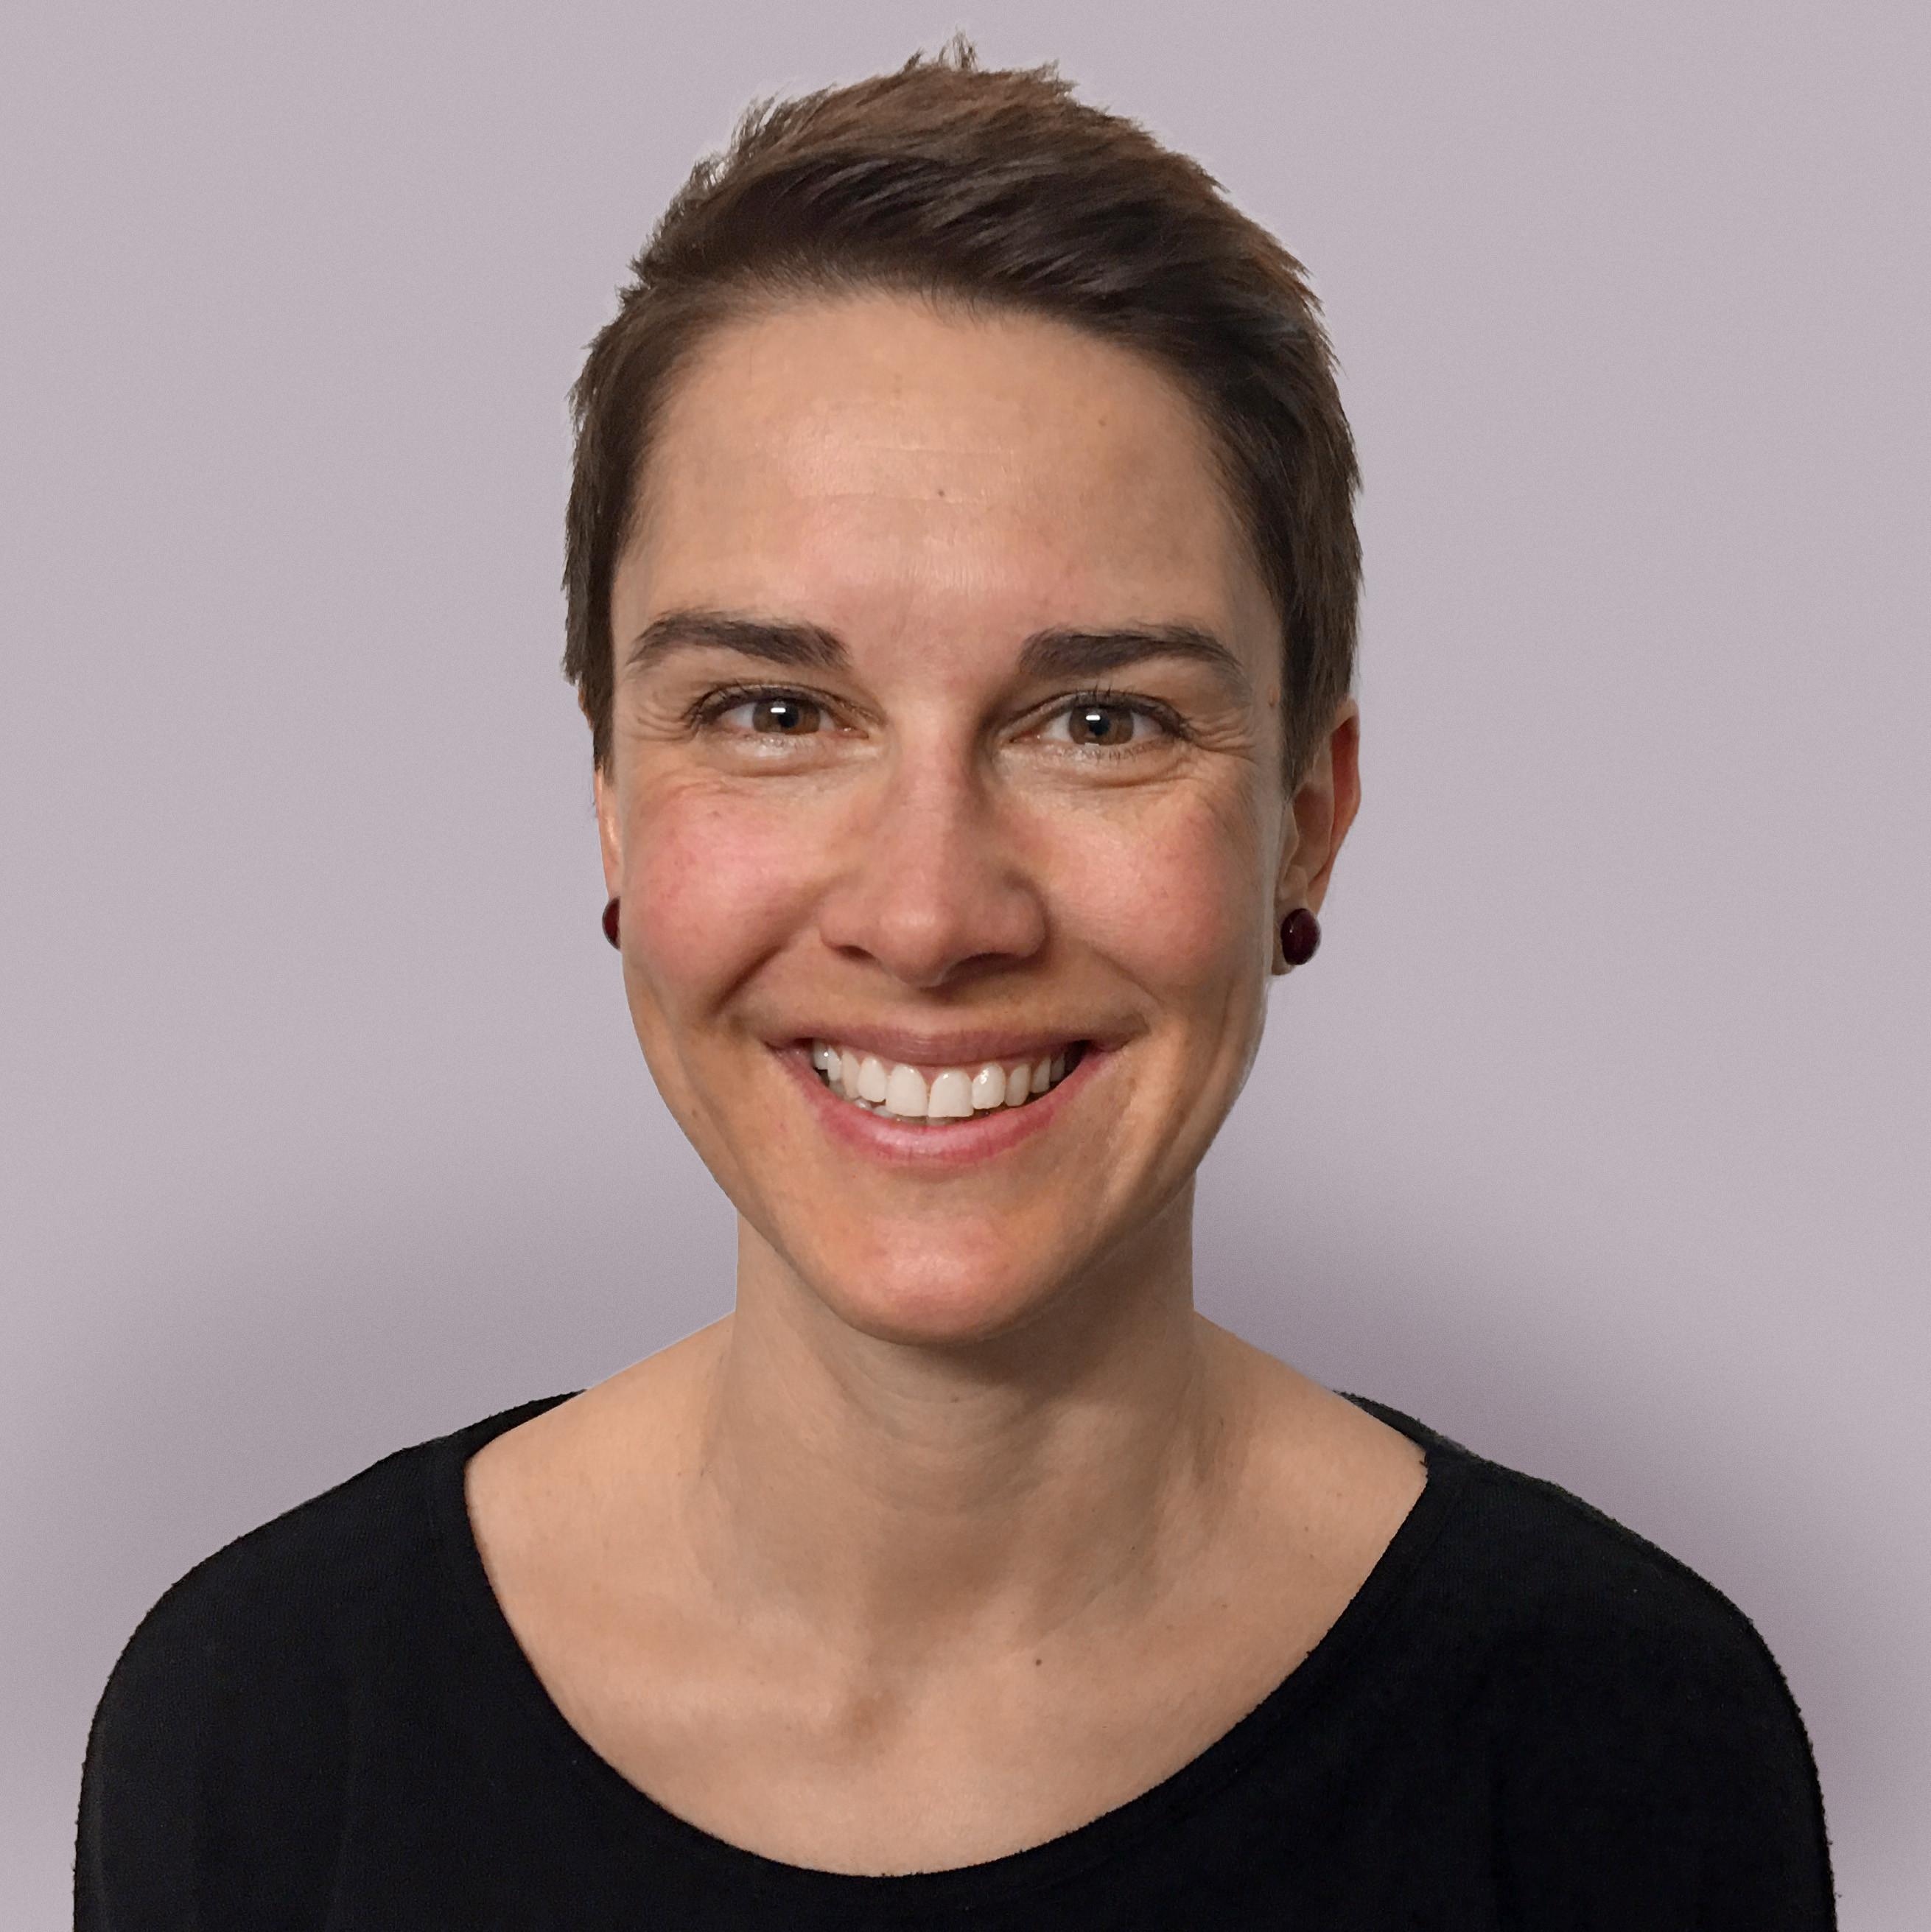 Daniela Rentsch